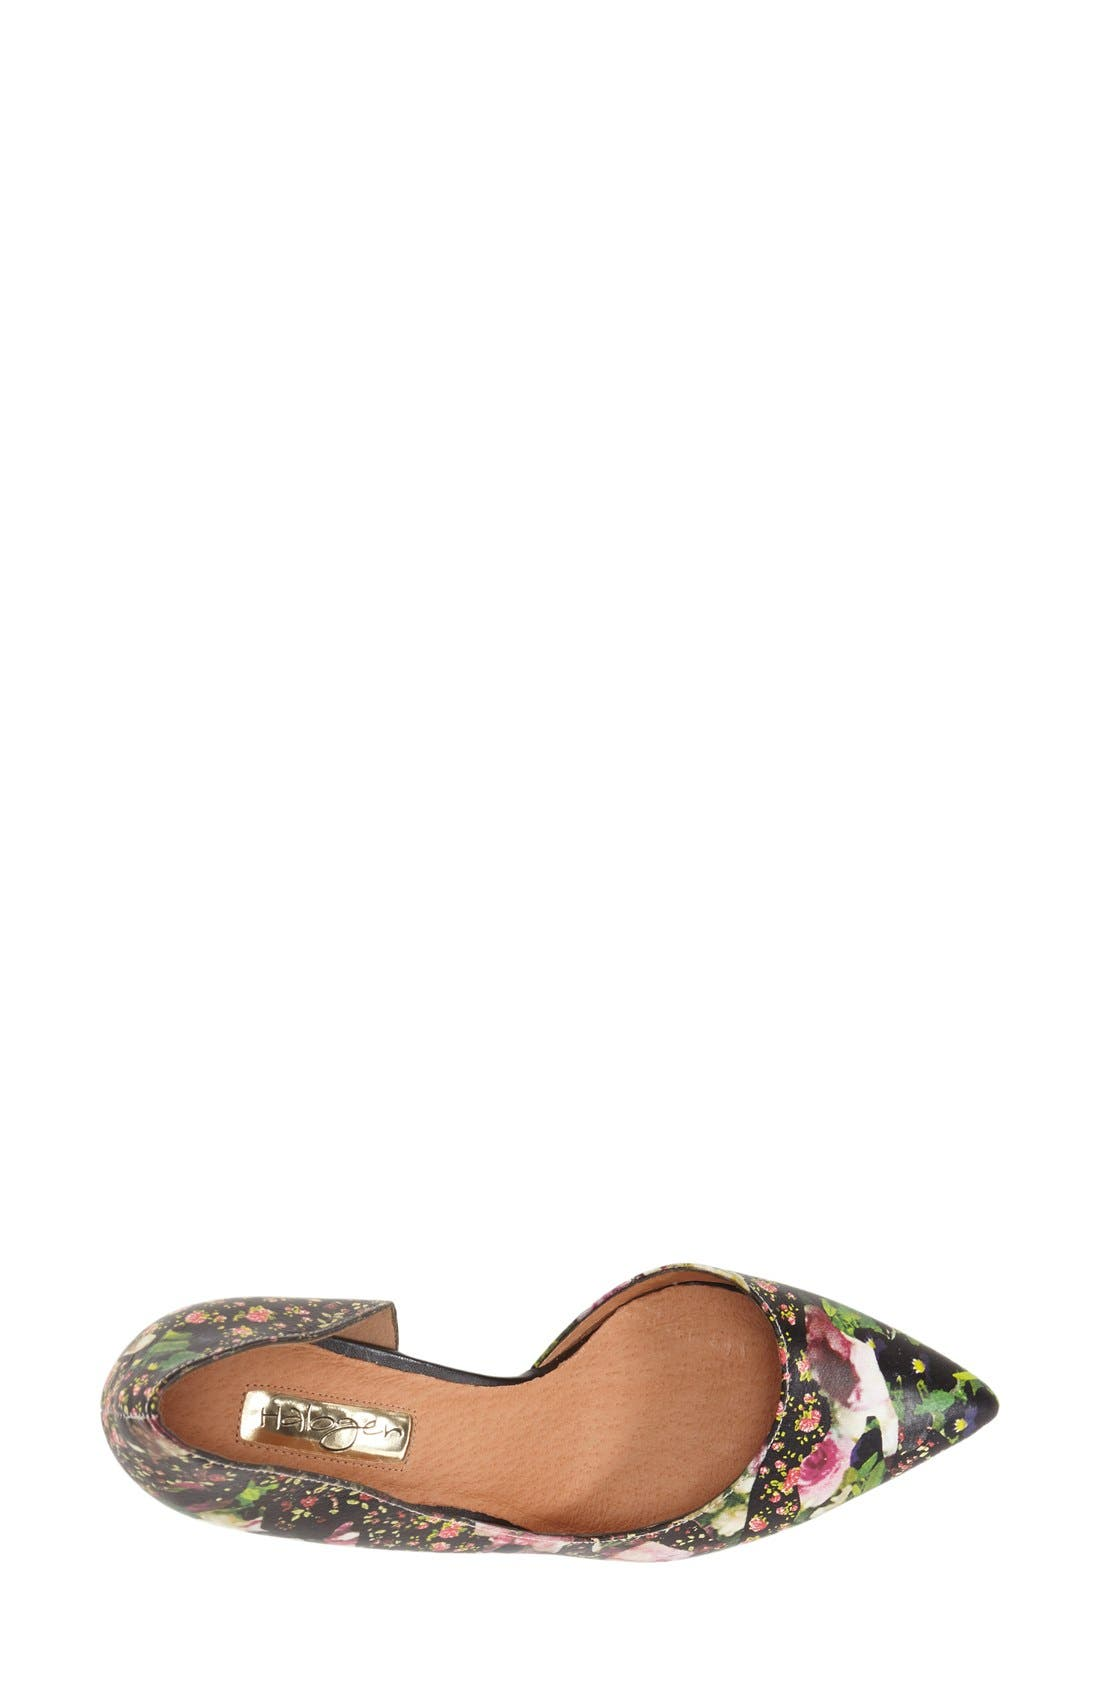 Alternate Image 3  - Halogen® 'Marlie' Pointy Toe Pump (Women)